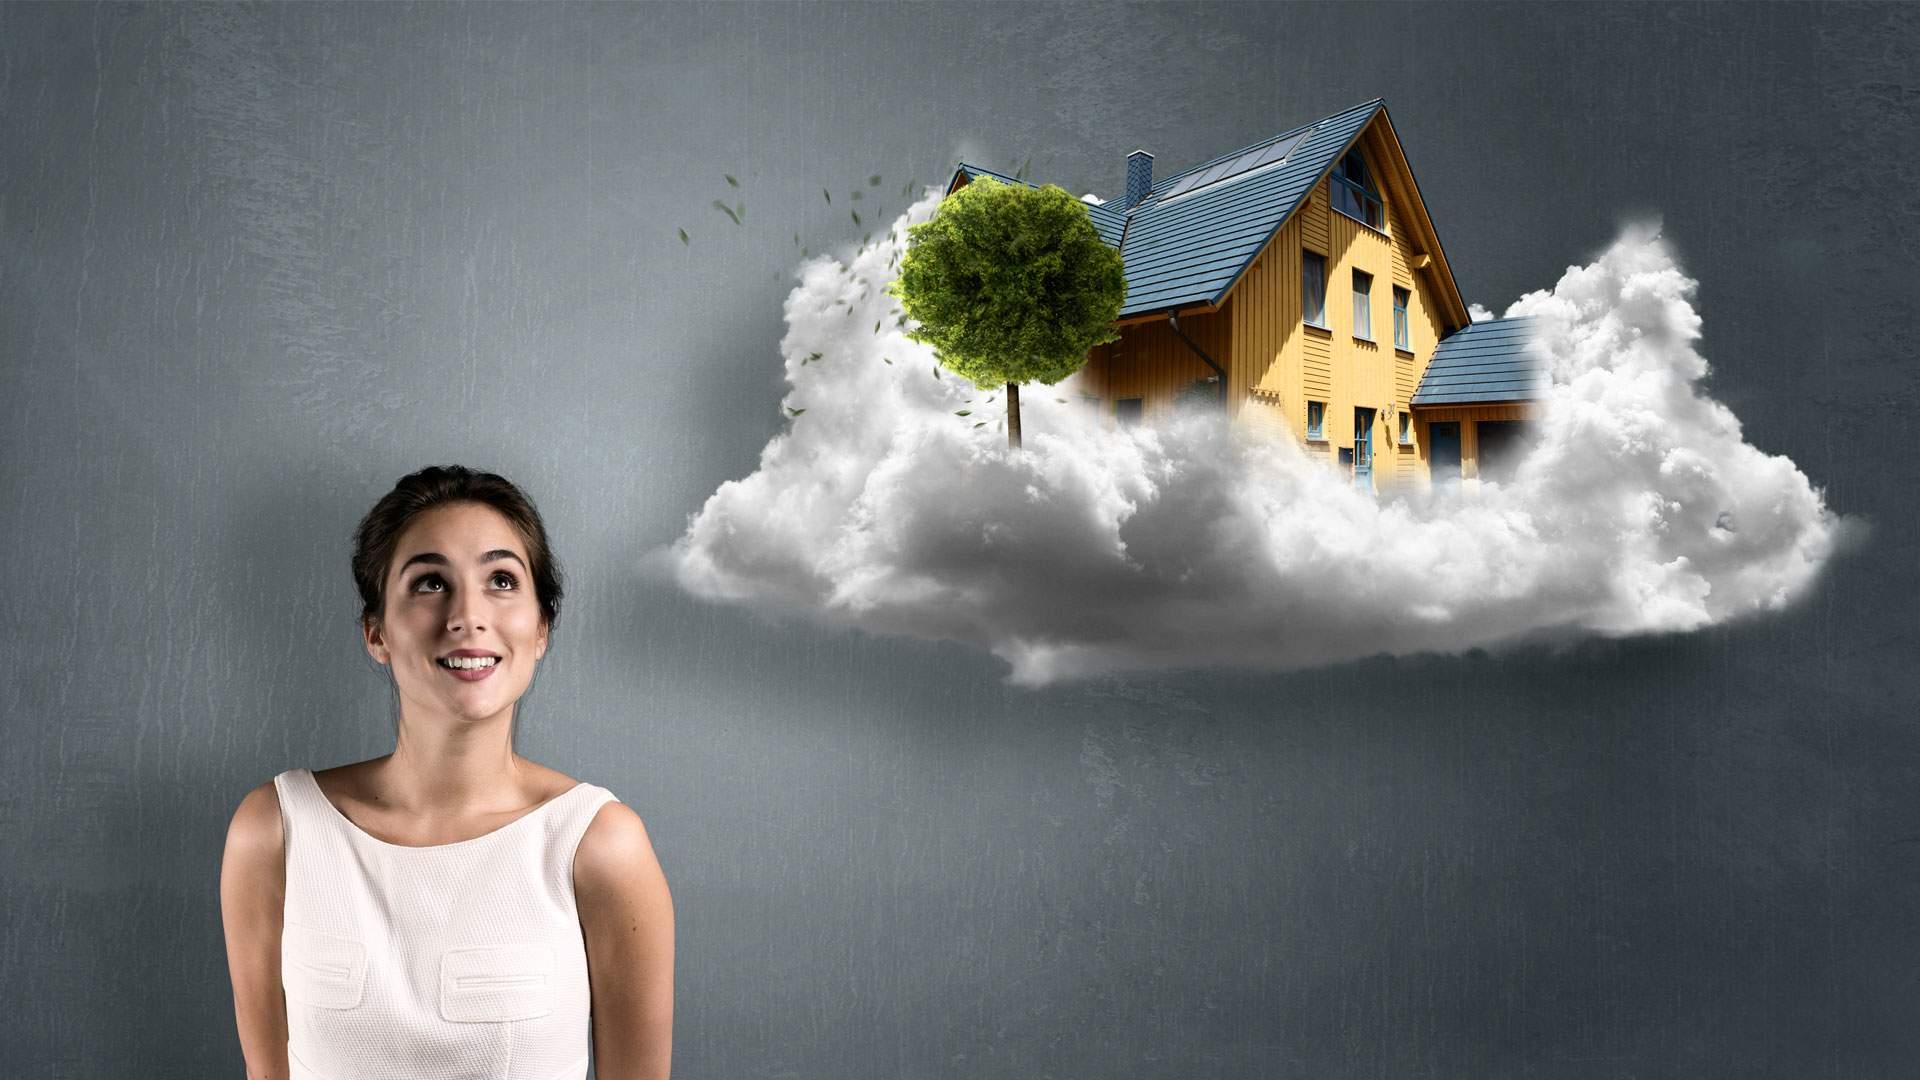 Ohne Eigenkapital ins Eigenheim